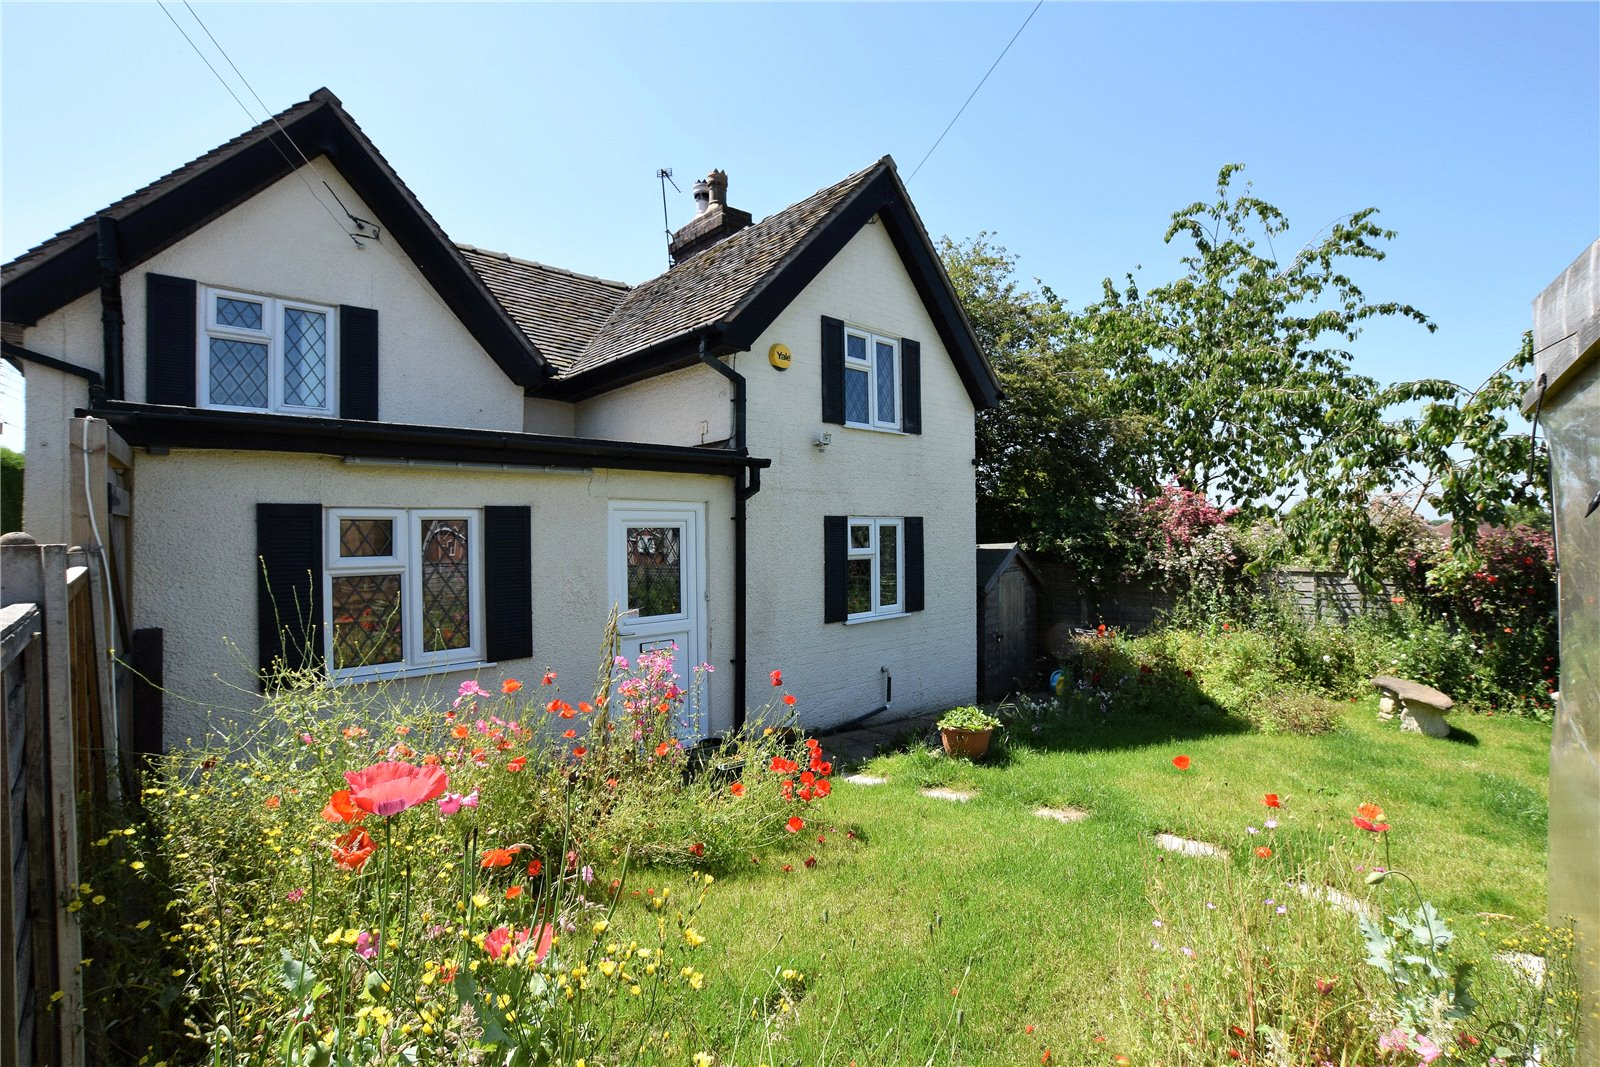 Sutherland Cottage, Duke Street, St. Georges, Telford, TF2